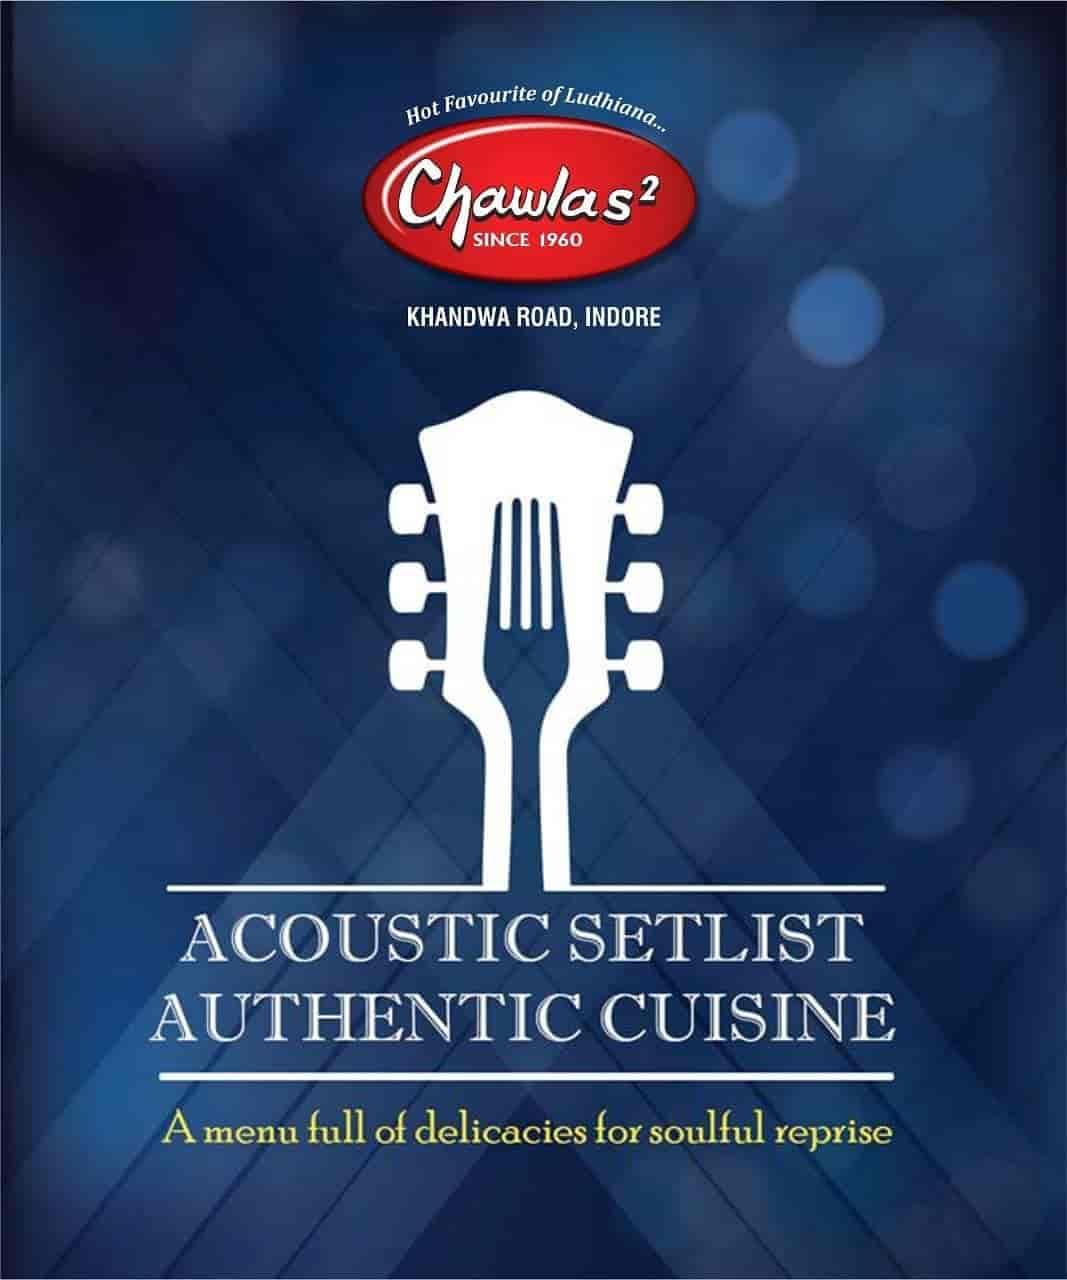 Chawla's 2, Bhawar Kuan, Indore - Restaurants - Justdial